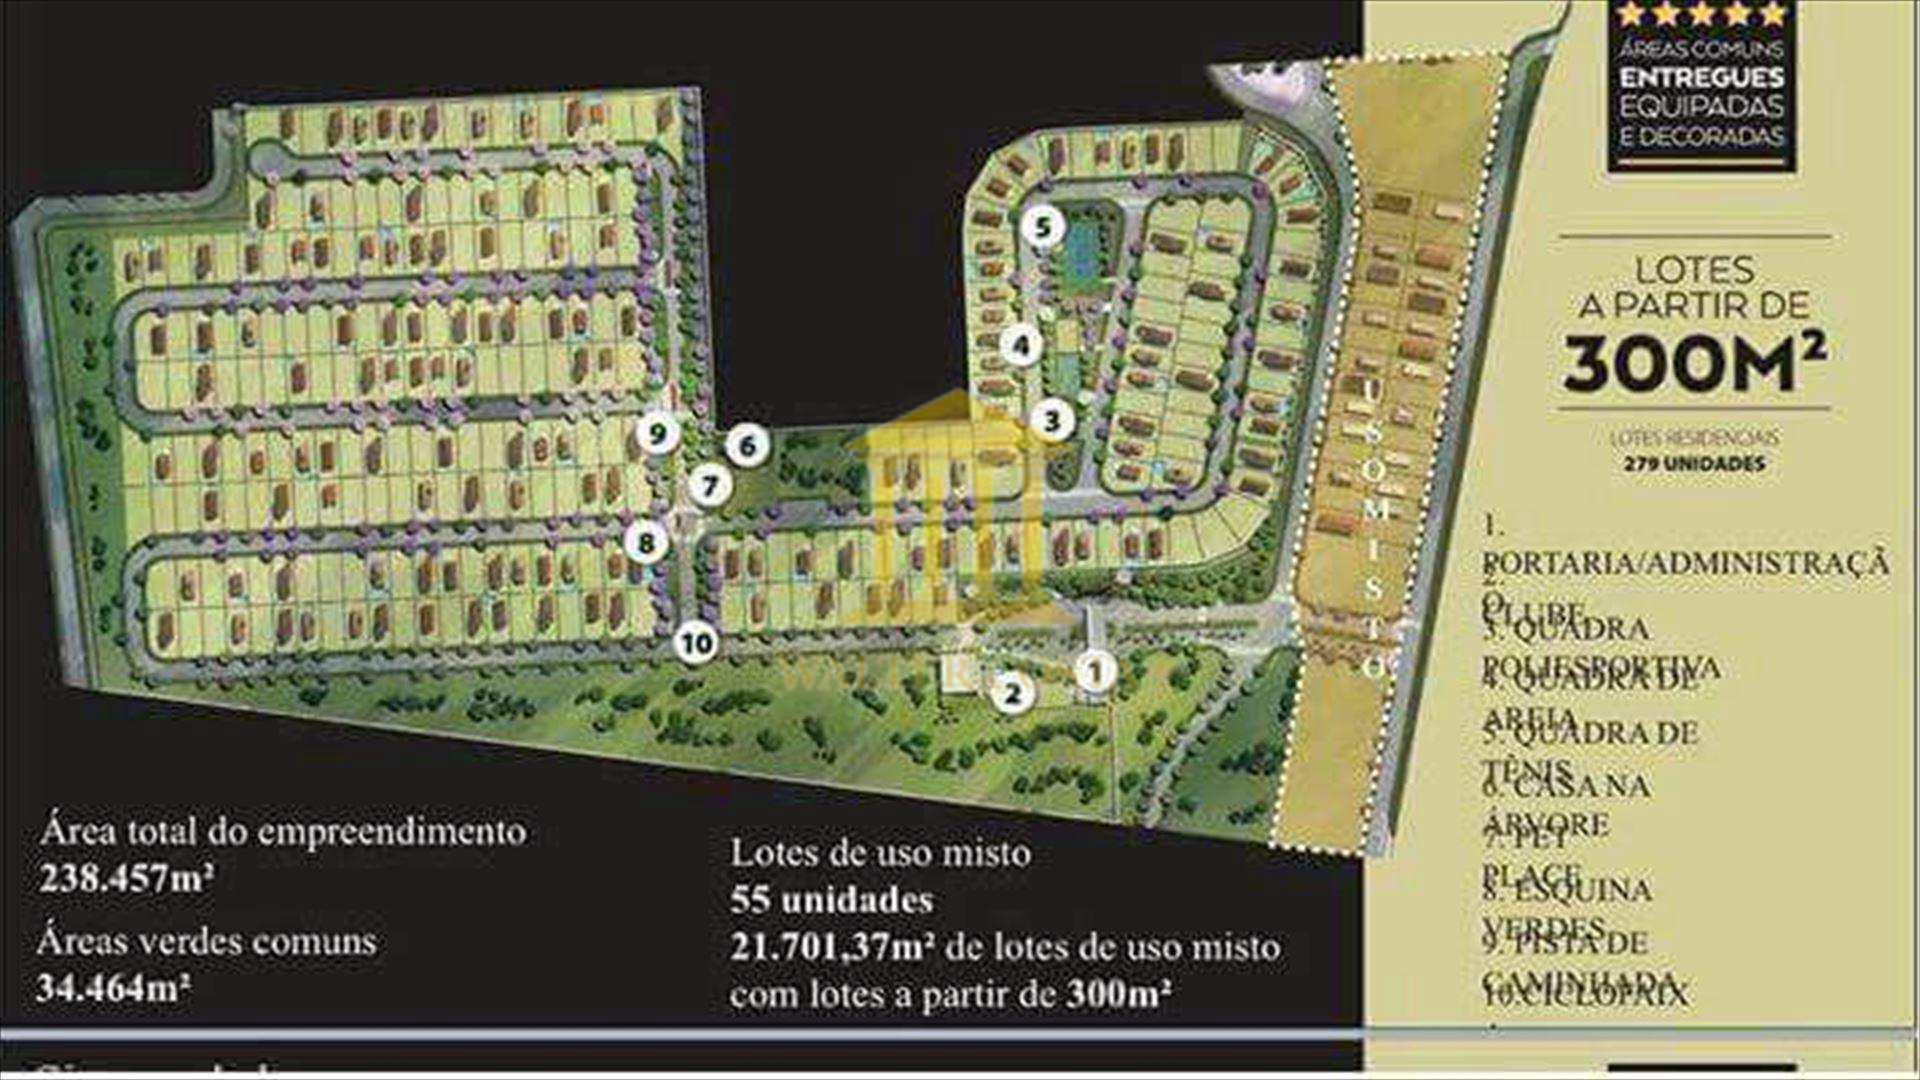 14400-TERRENOS_CONDOMINIO_LA_DOLCE_VITA_PAULIN_07.jpg